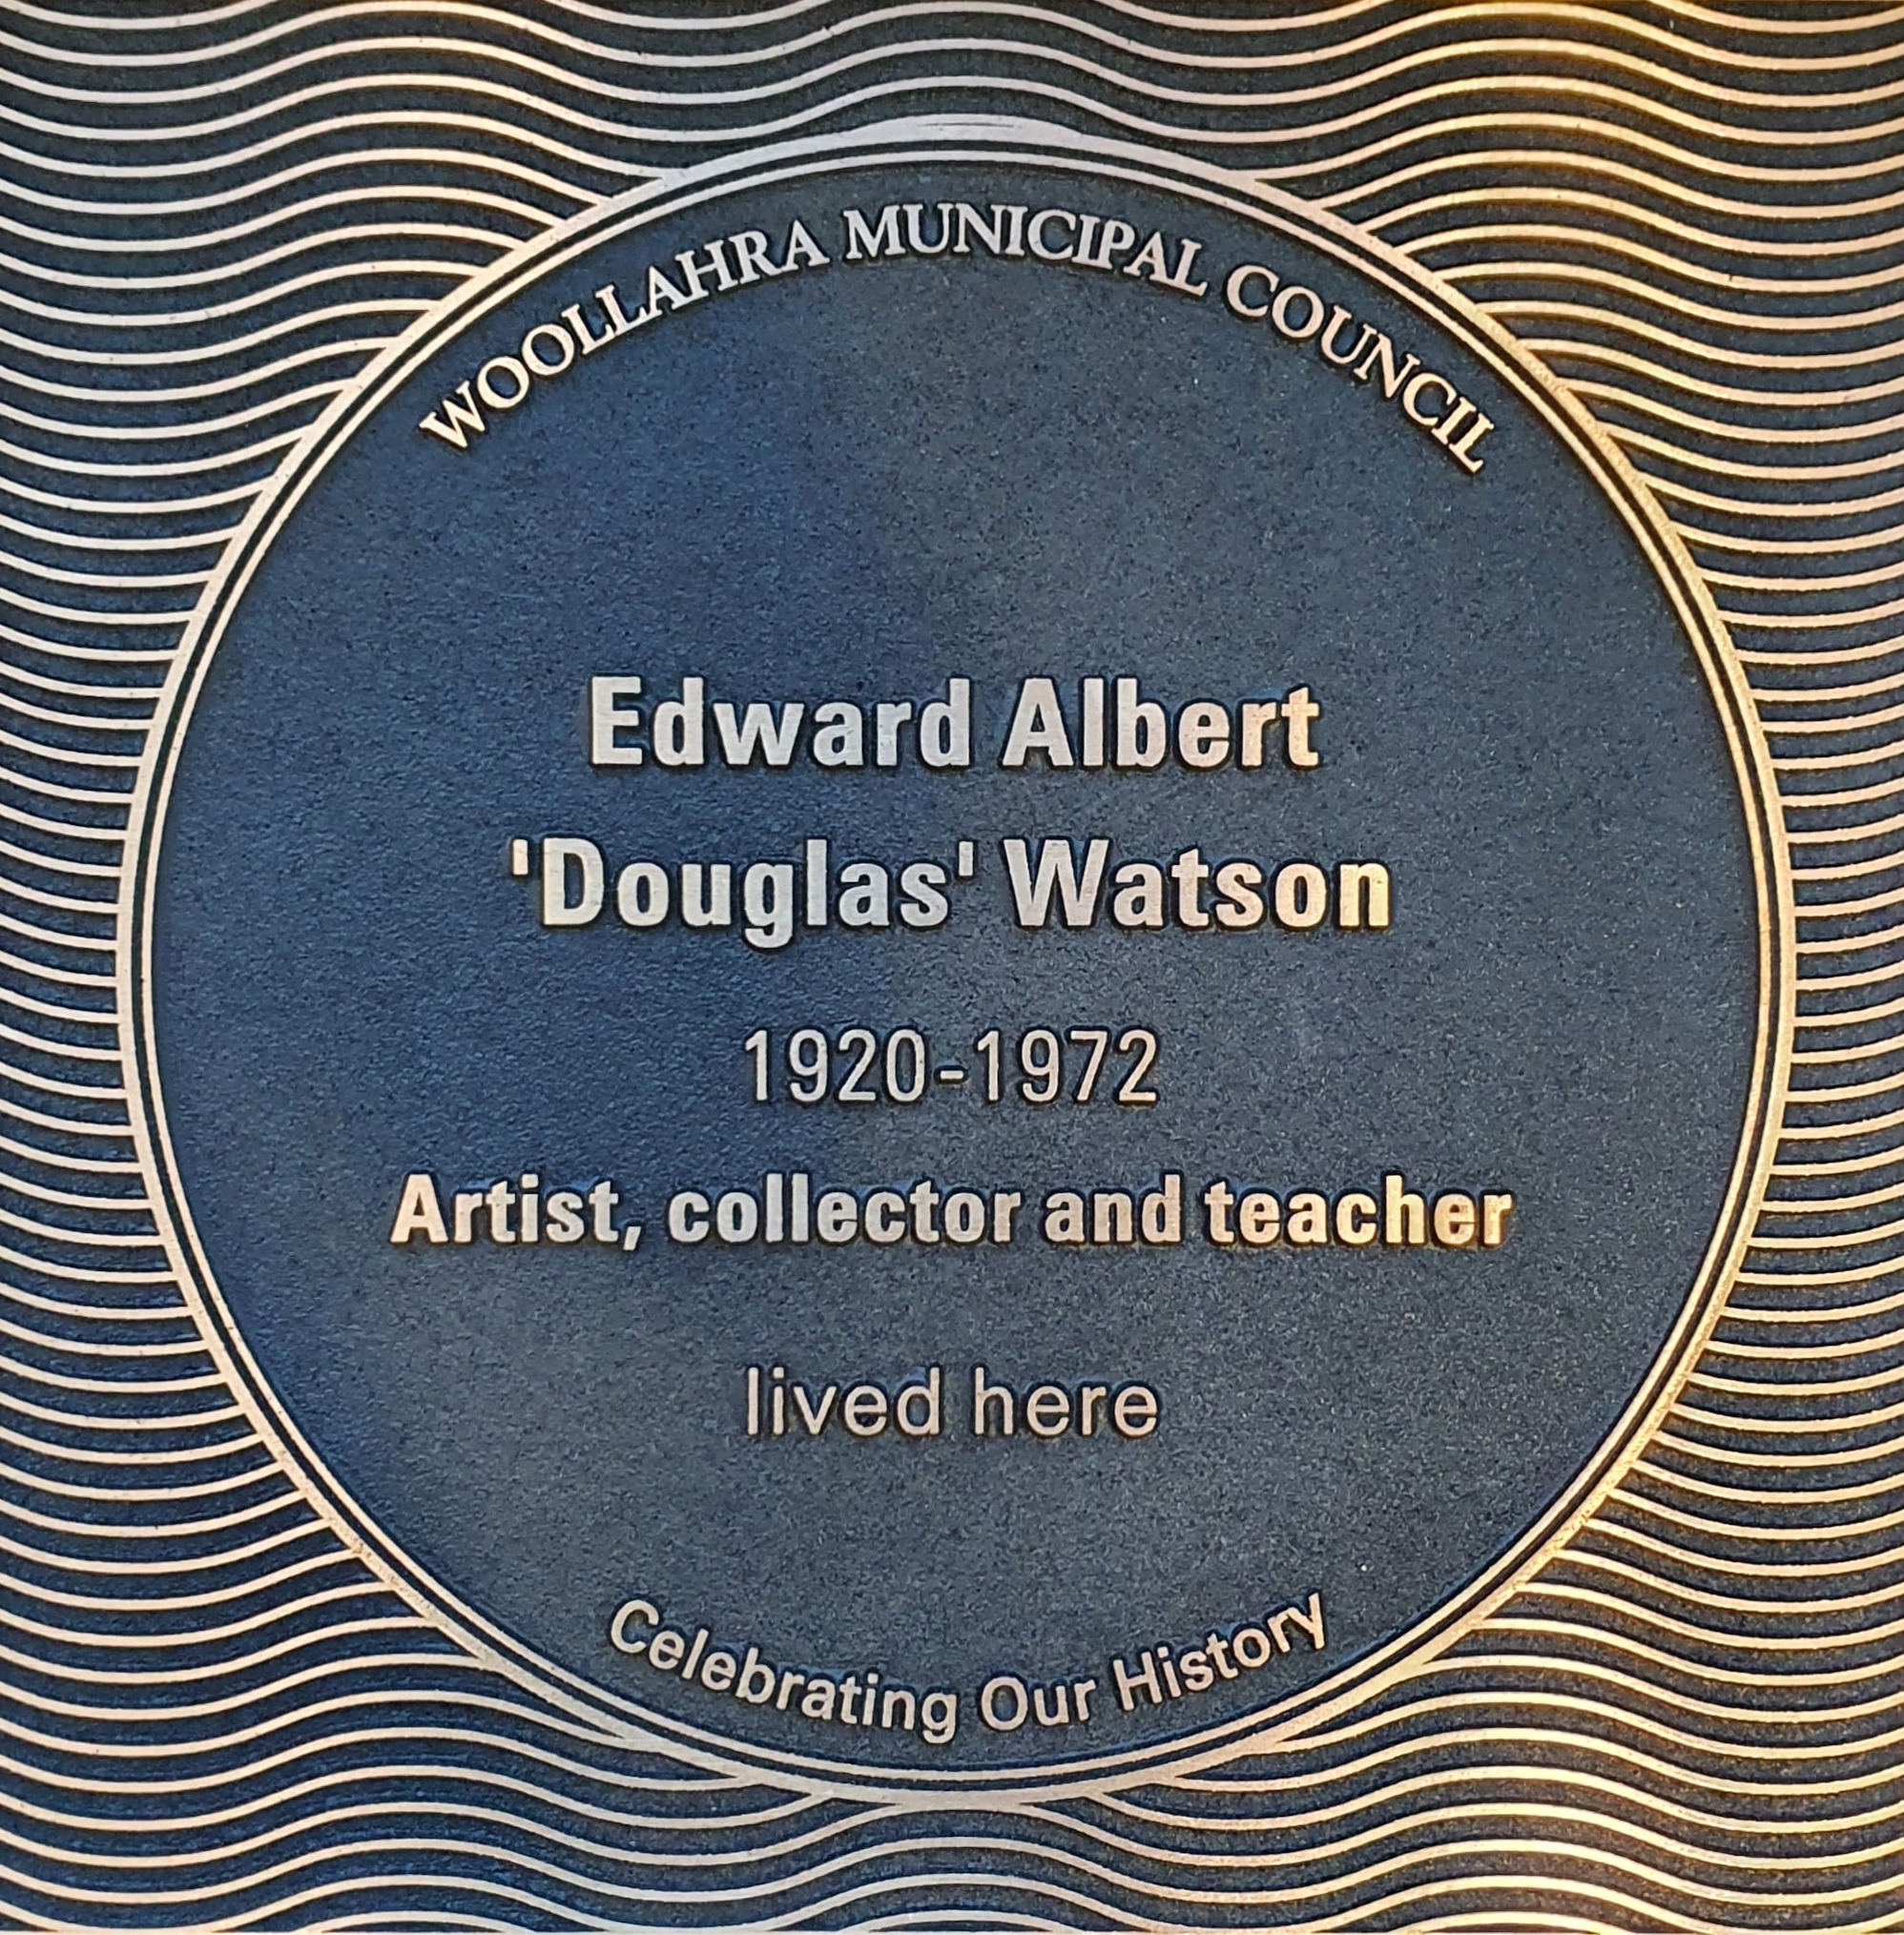 Edward Albert 'Douglas' Watson plaque